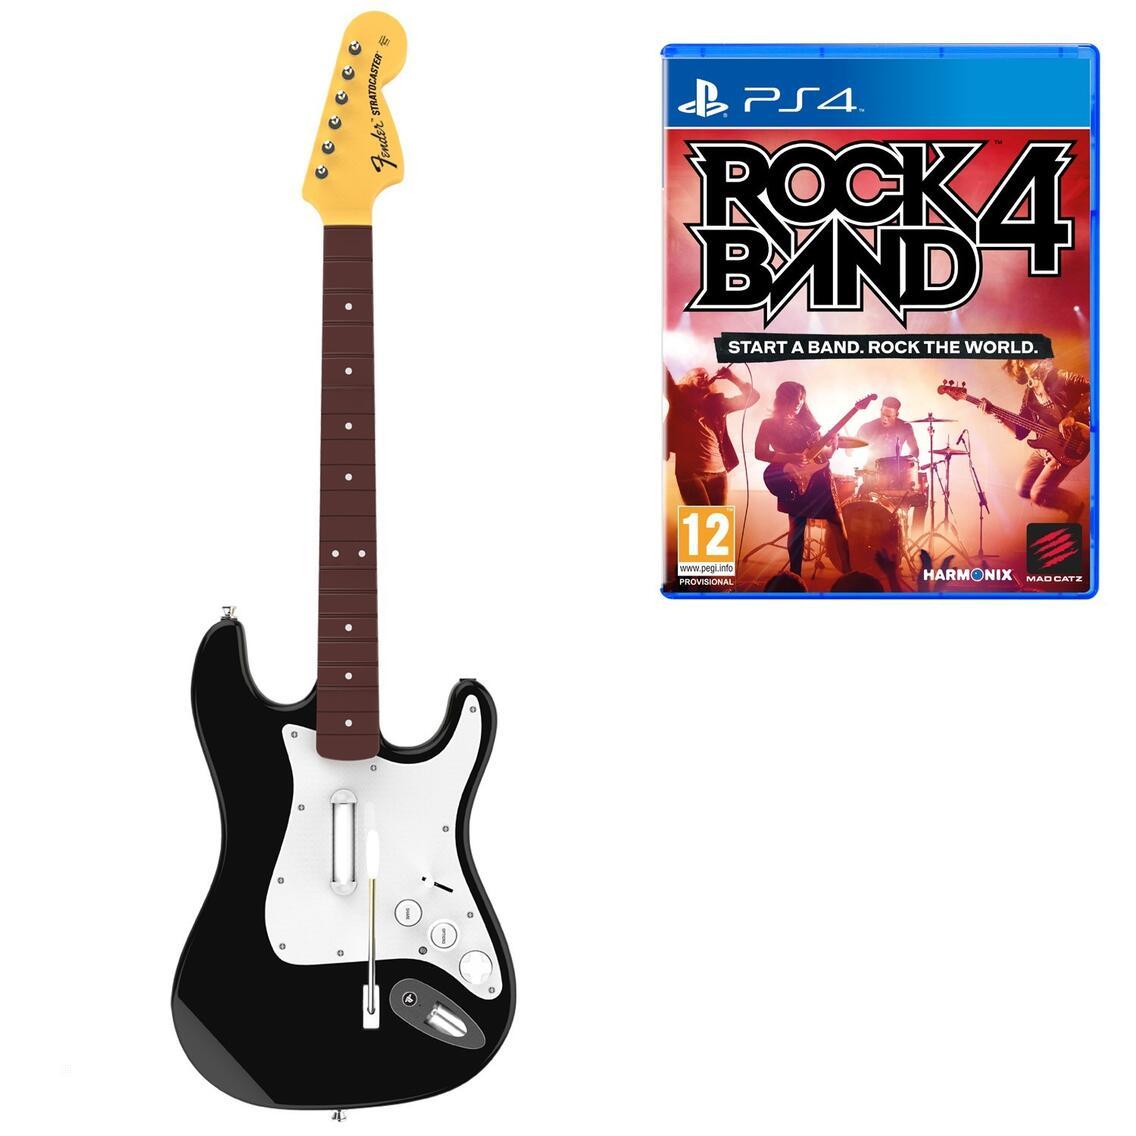 Rock Band 4 Gitarren-Bundle - GameStop.de: Power to the Players